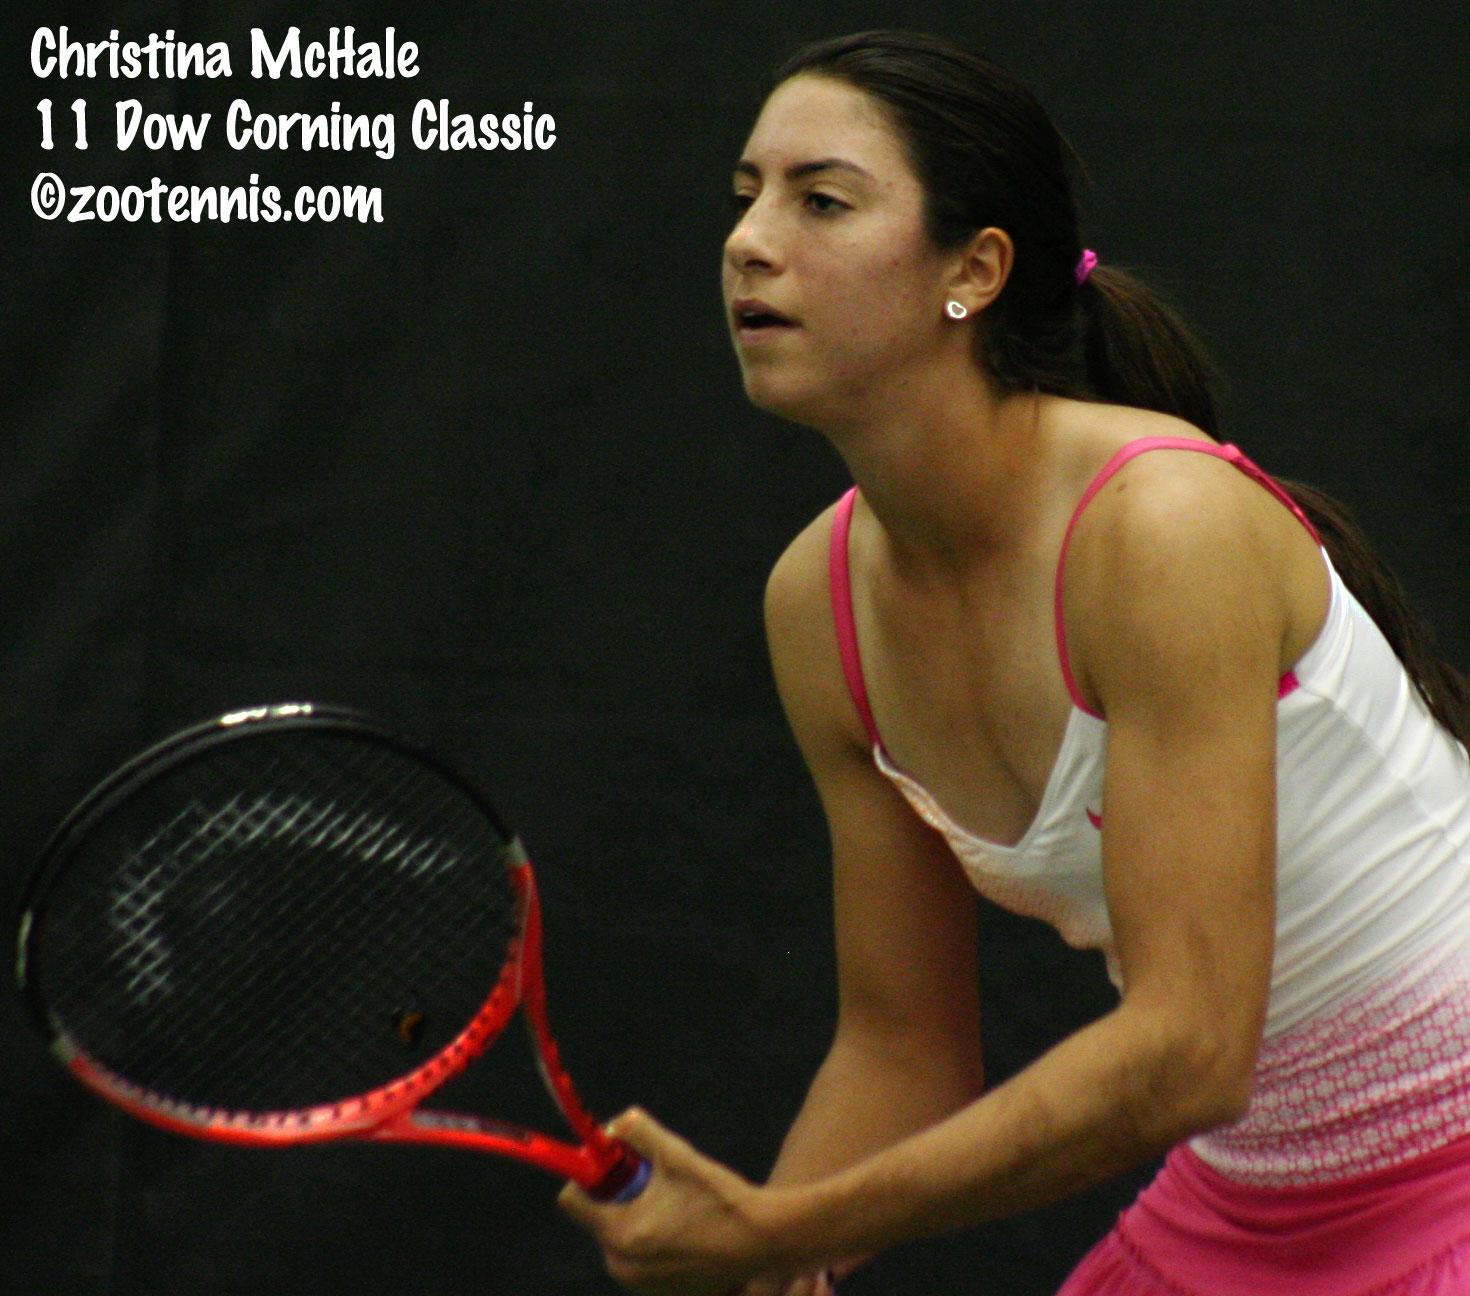 Christina Mchale Coach See Christina Mchale Put